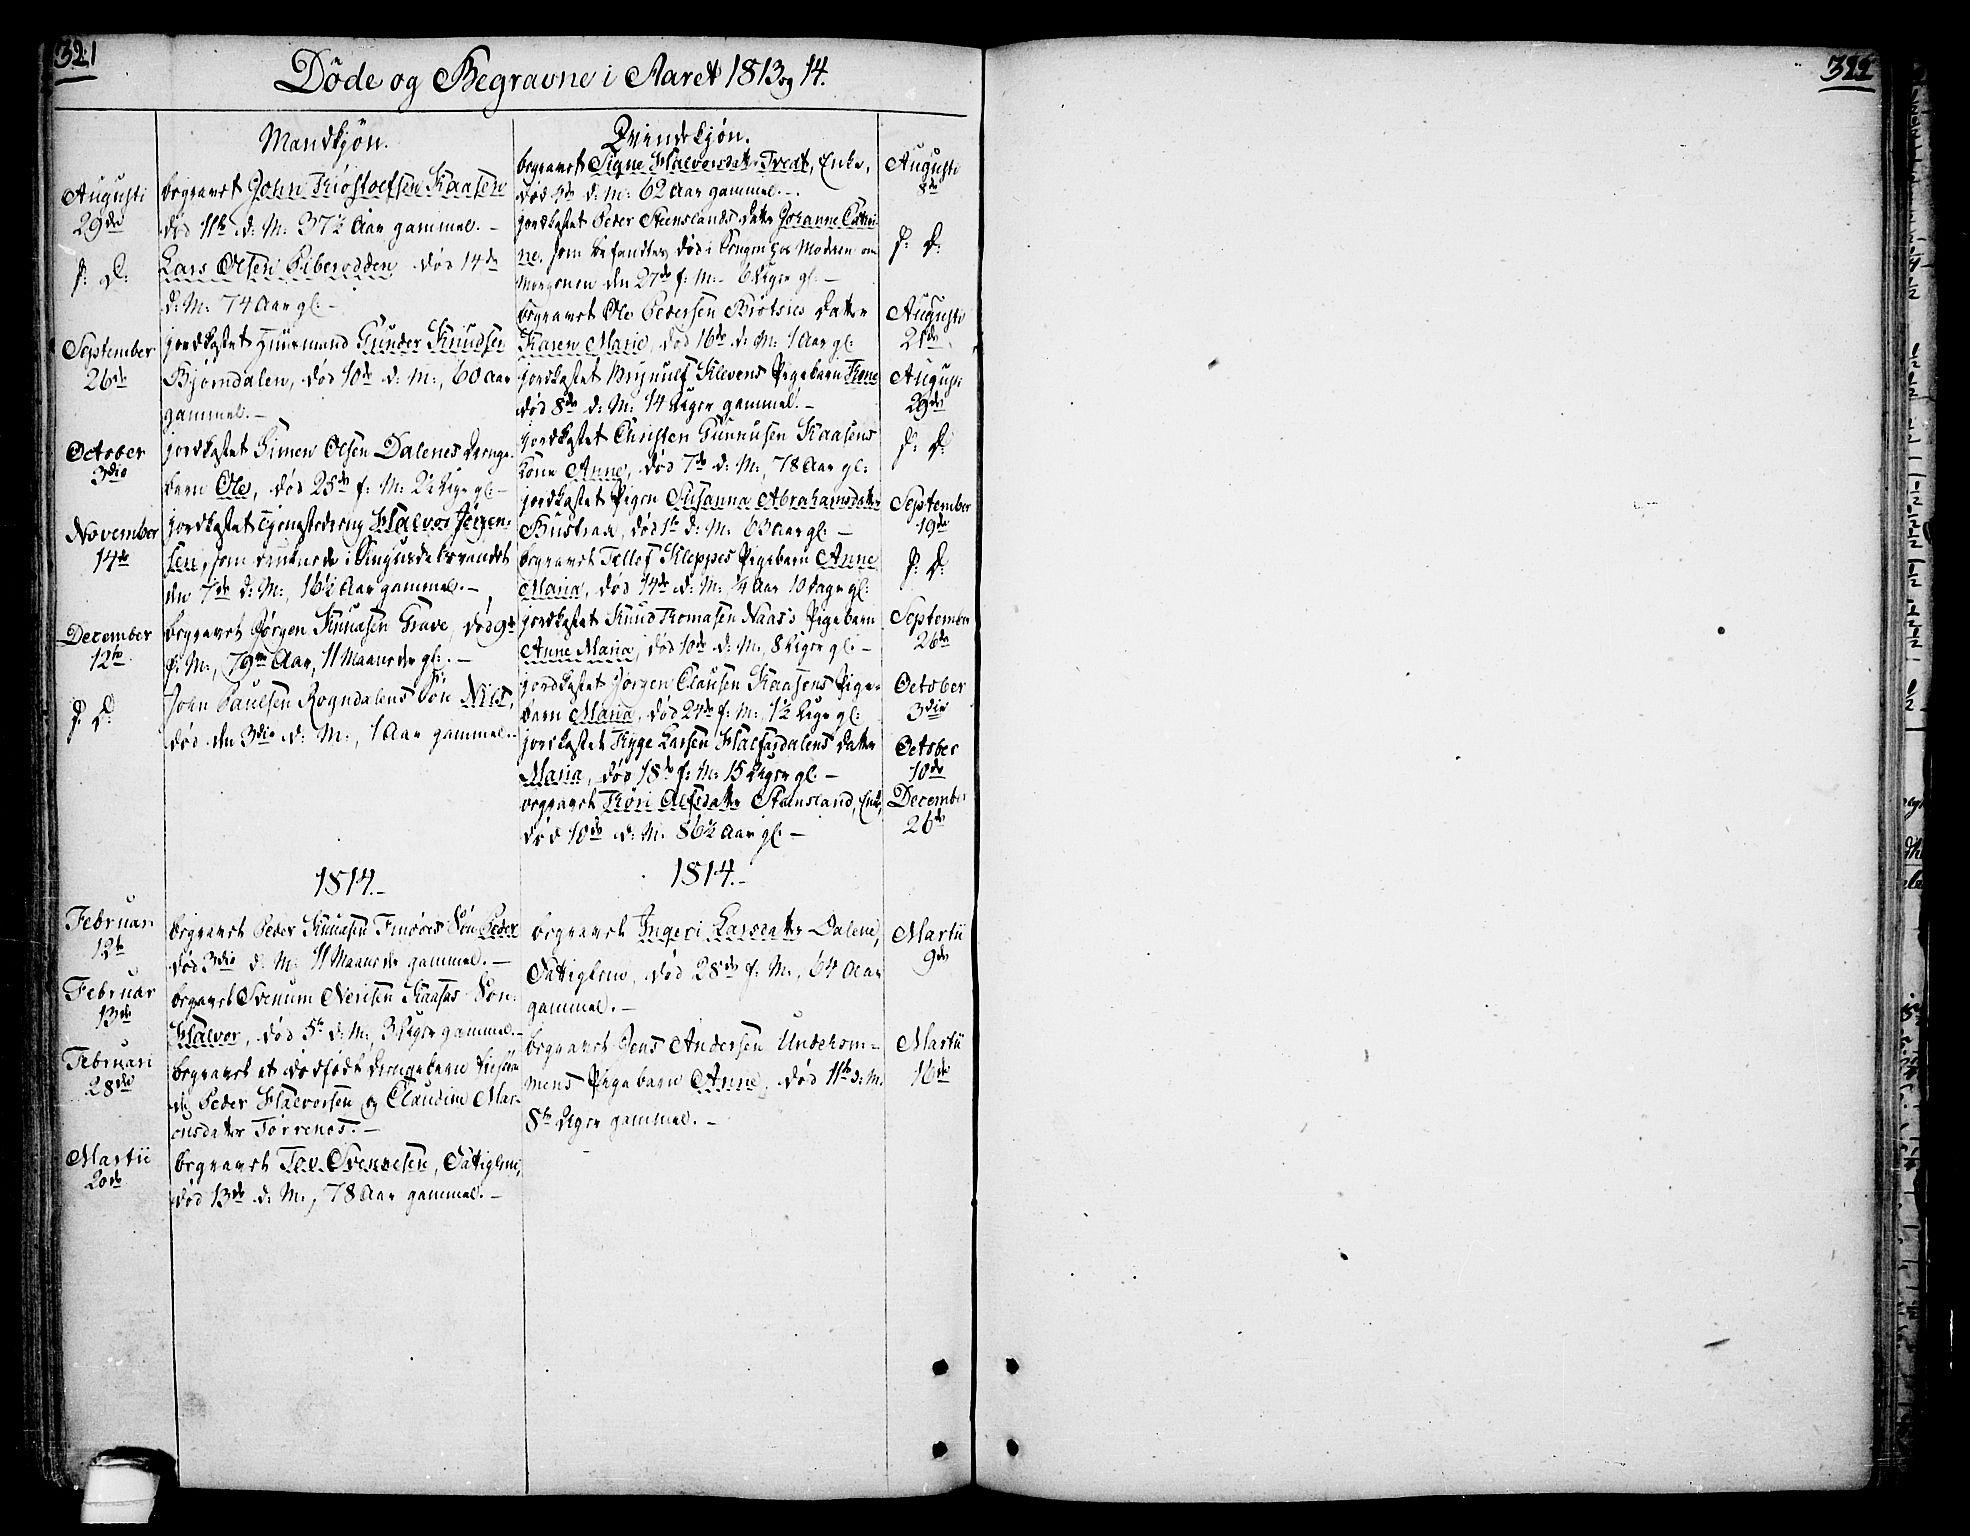 SAKO, Drangedal kirkebøker, F/Fa/L0003: Ministerialbok nr. 3, 1768-1814, s. 321-322